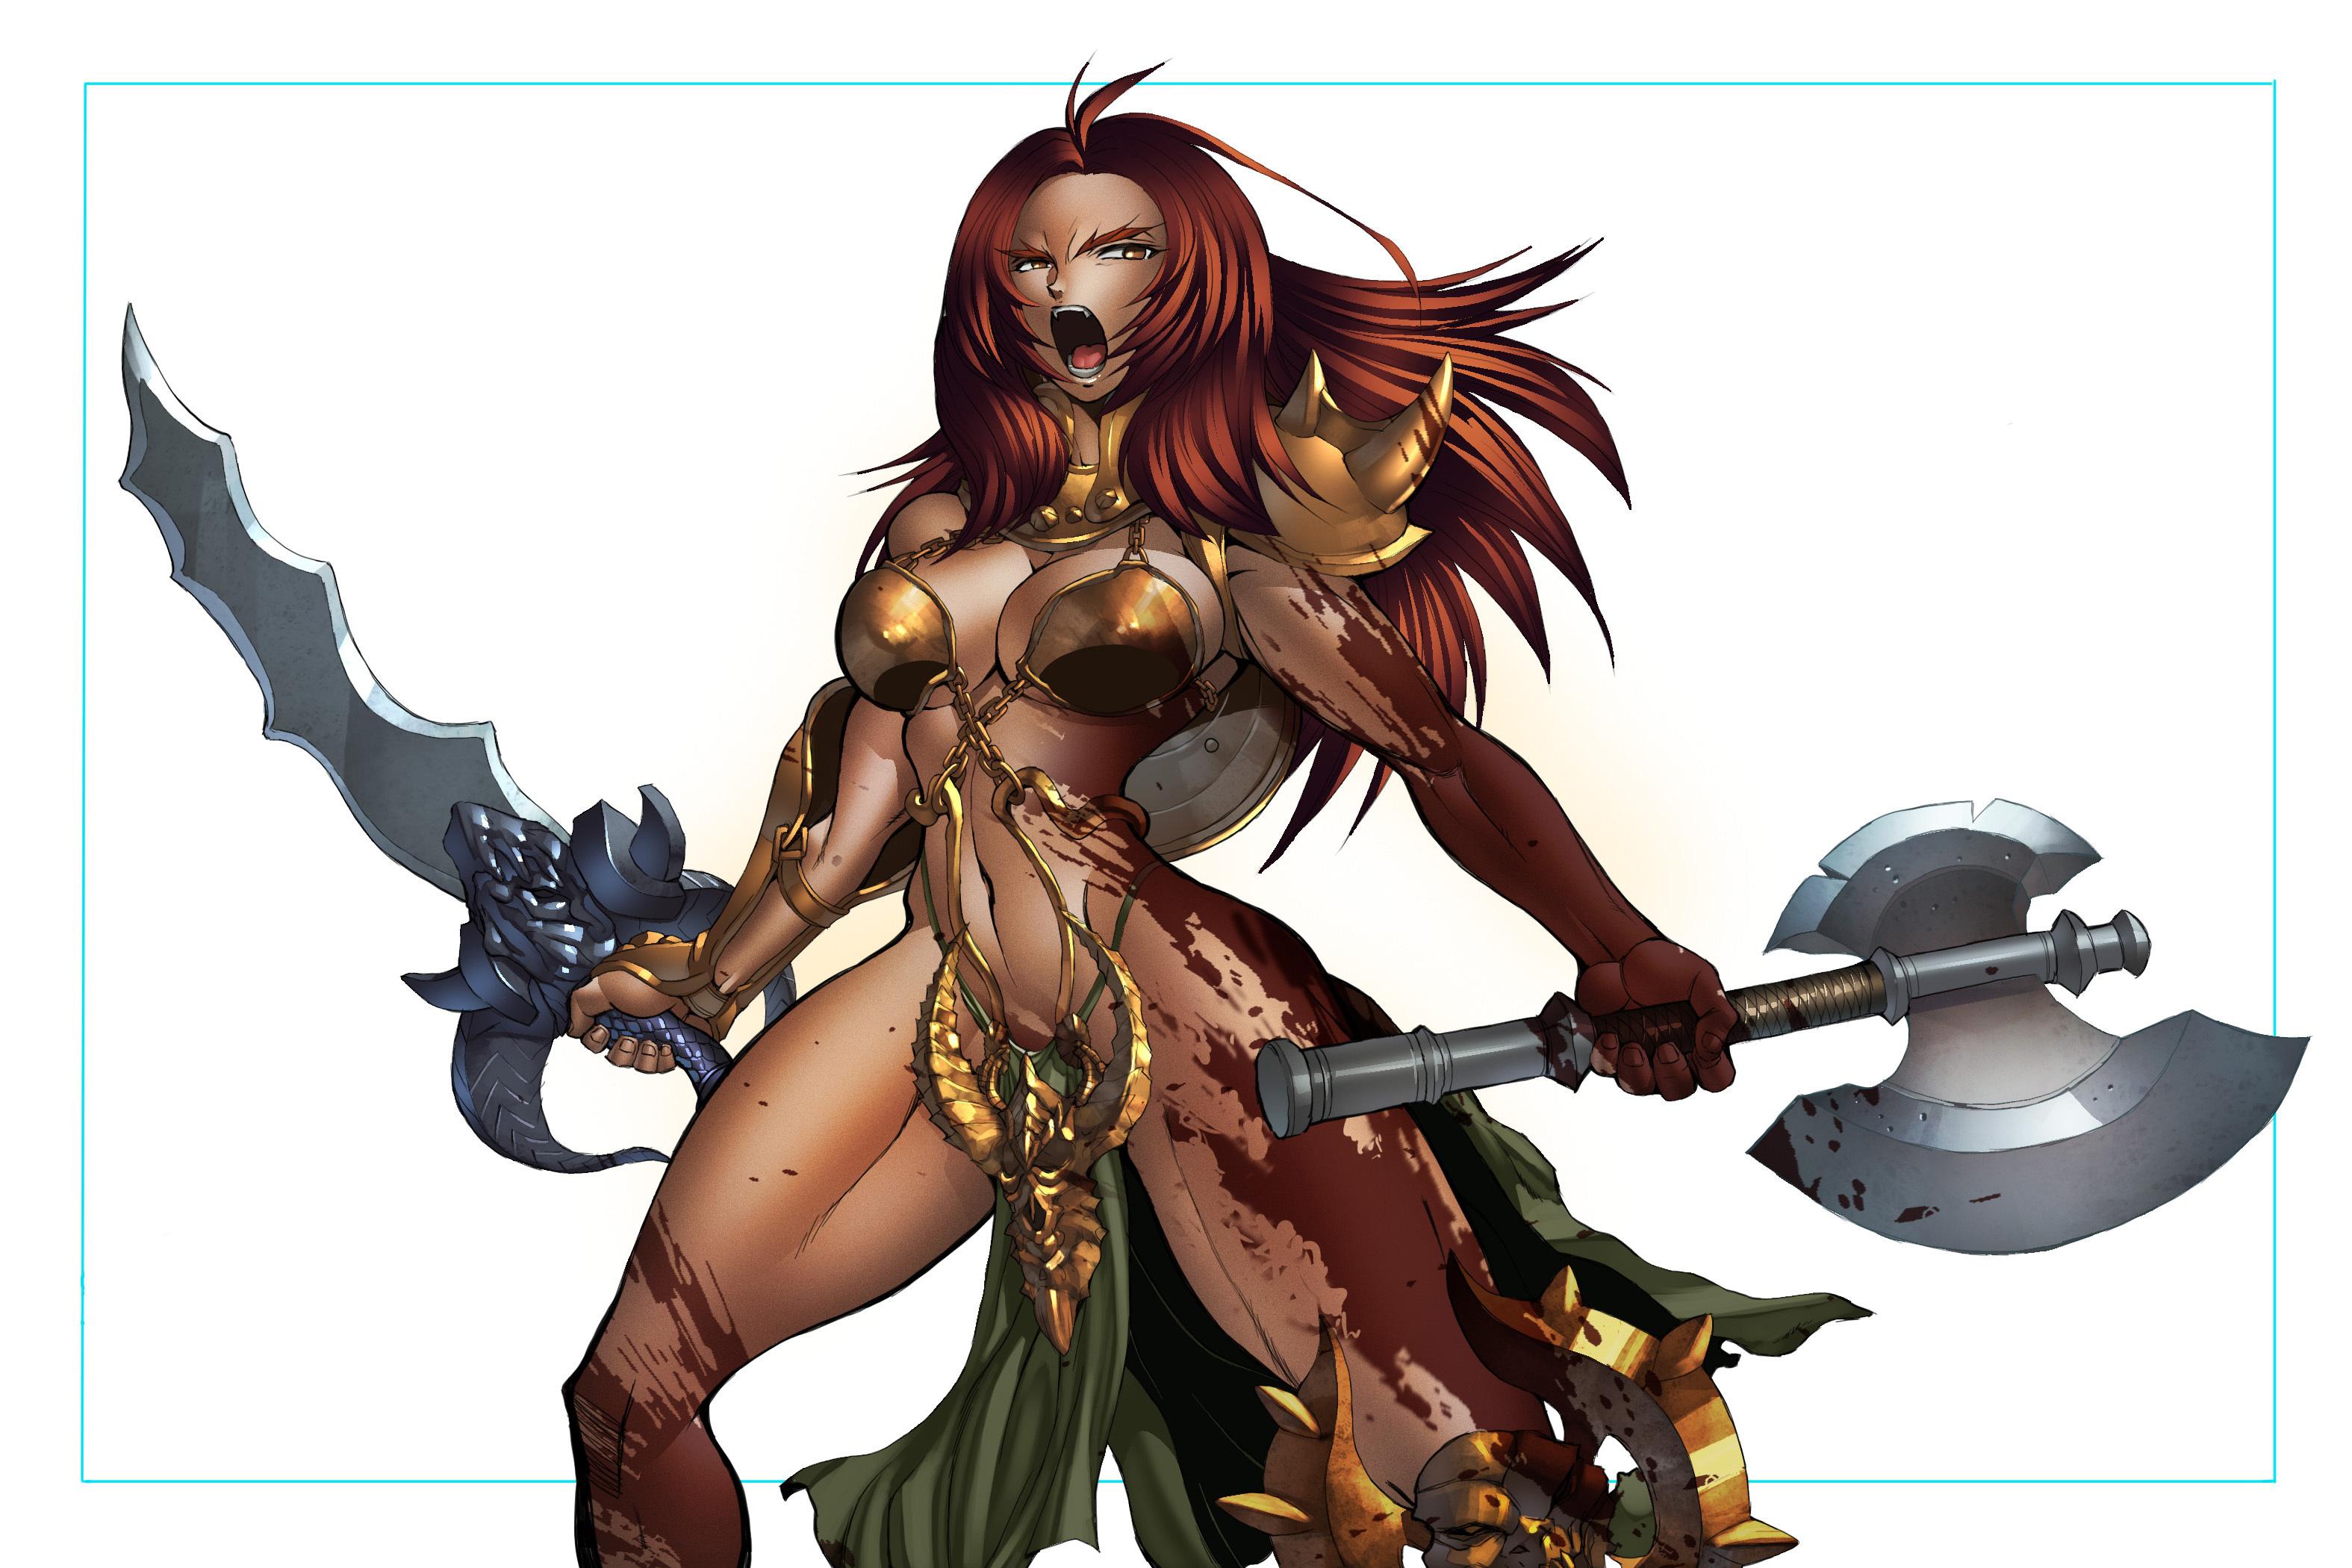 Sexy Barbarian